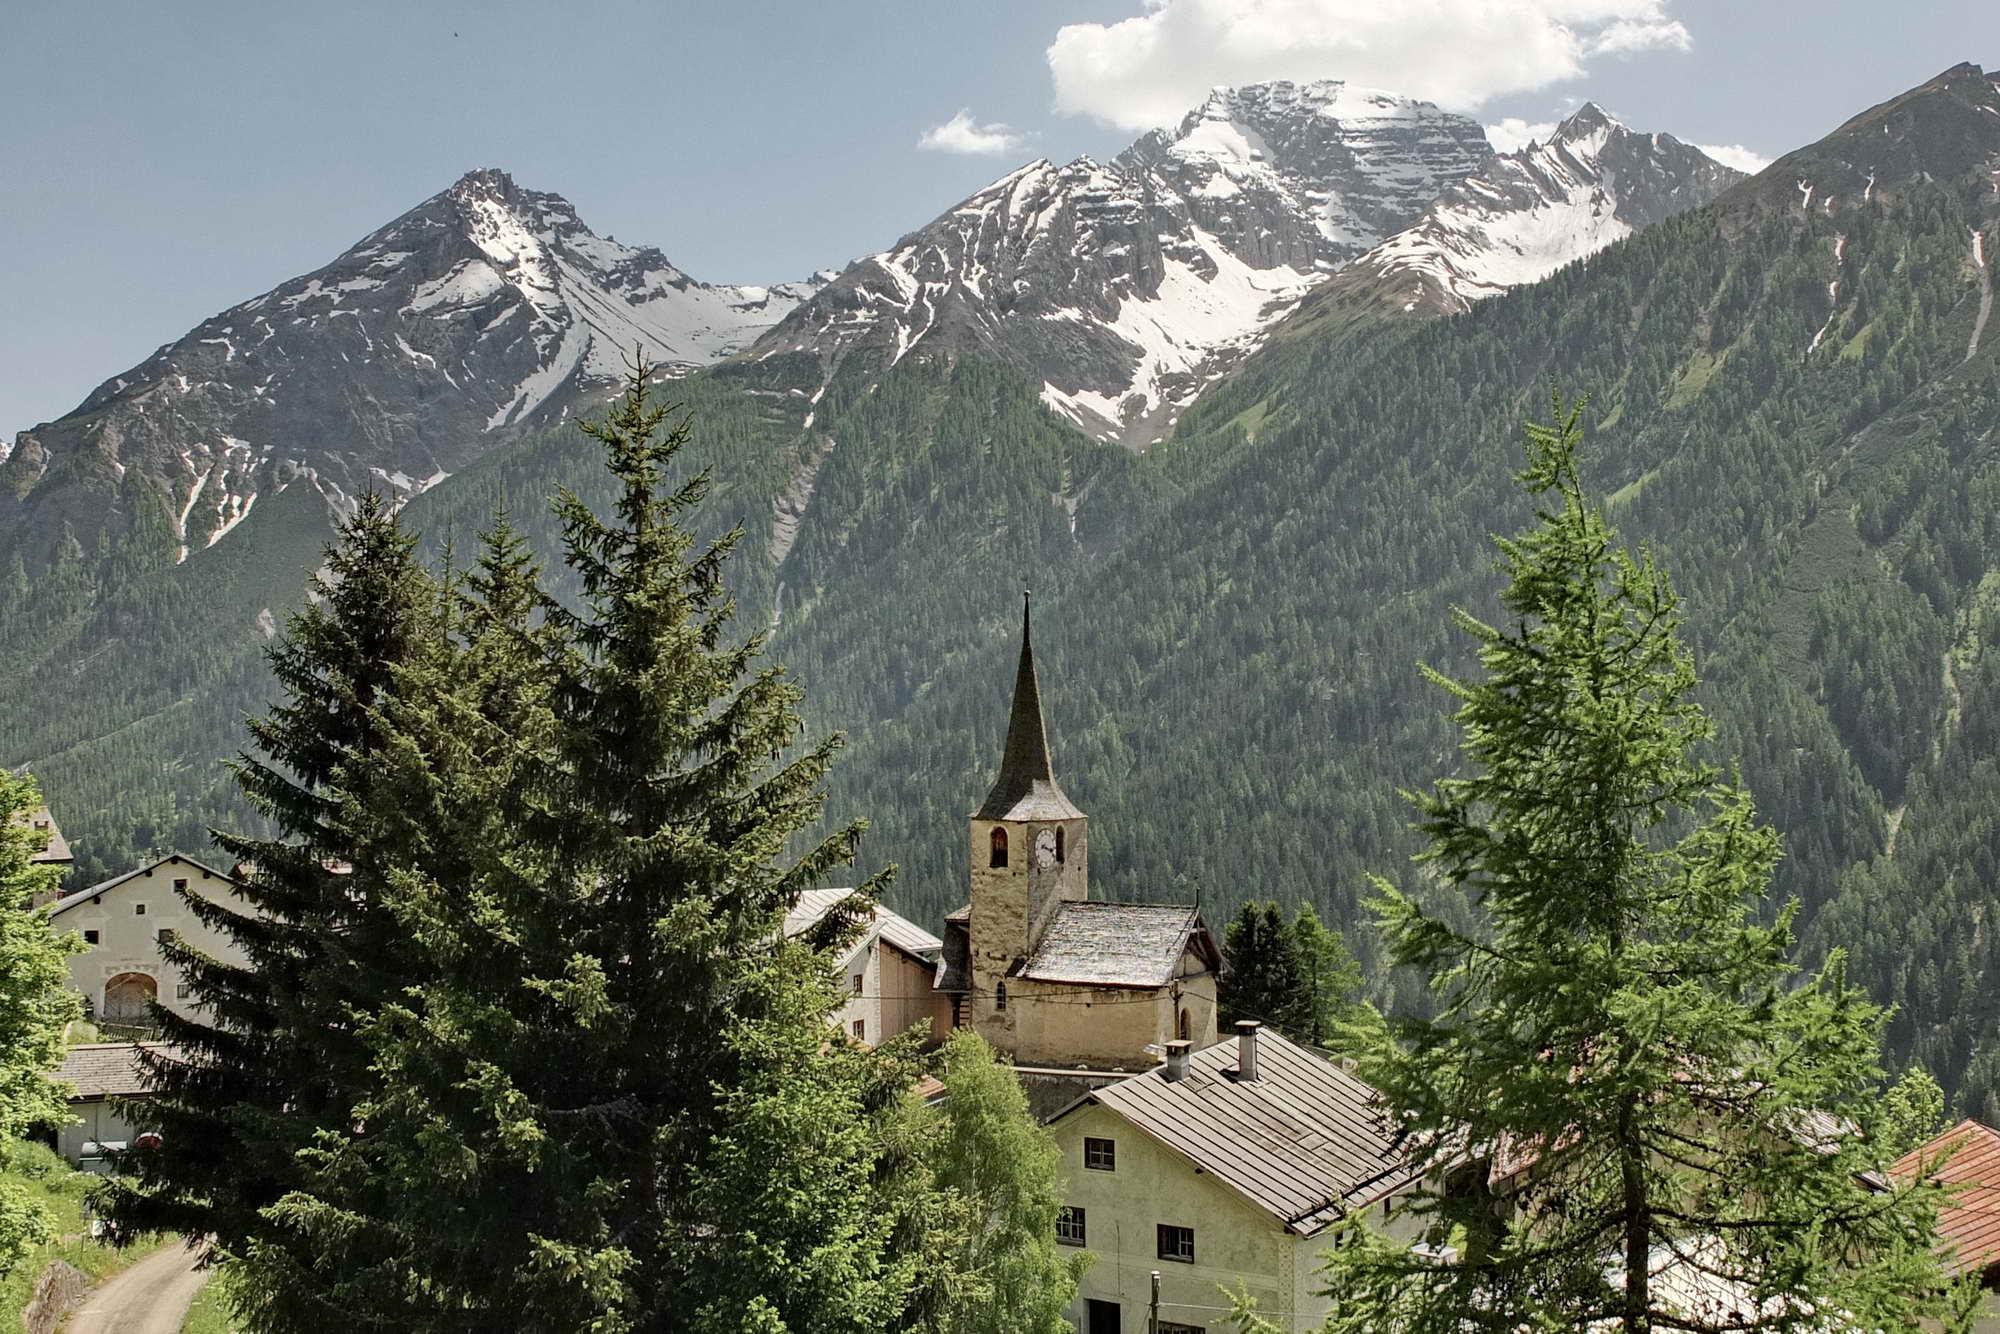 MT 6.1 Bergün/Bravuogn > Filisur (Graubünden)